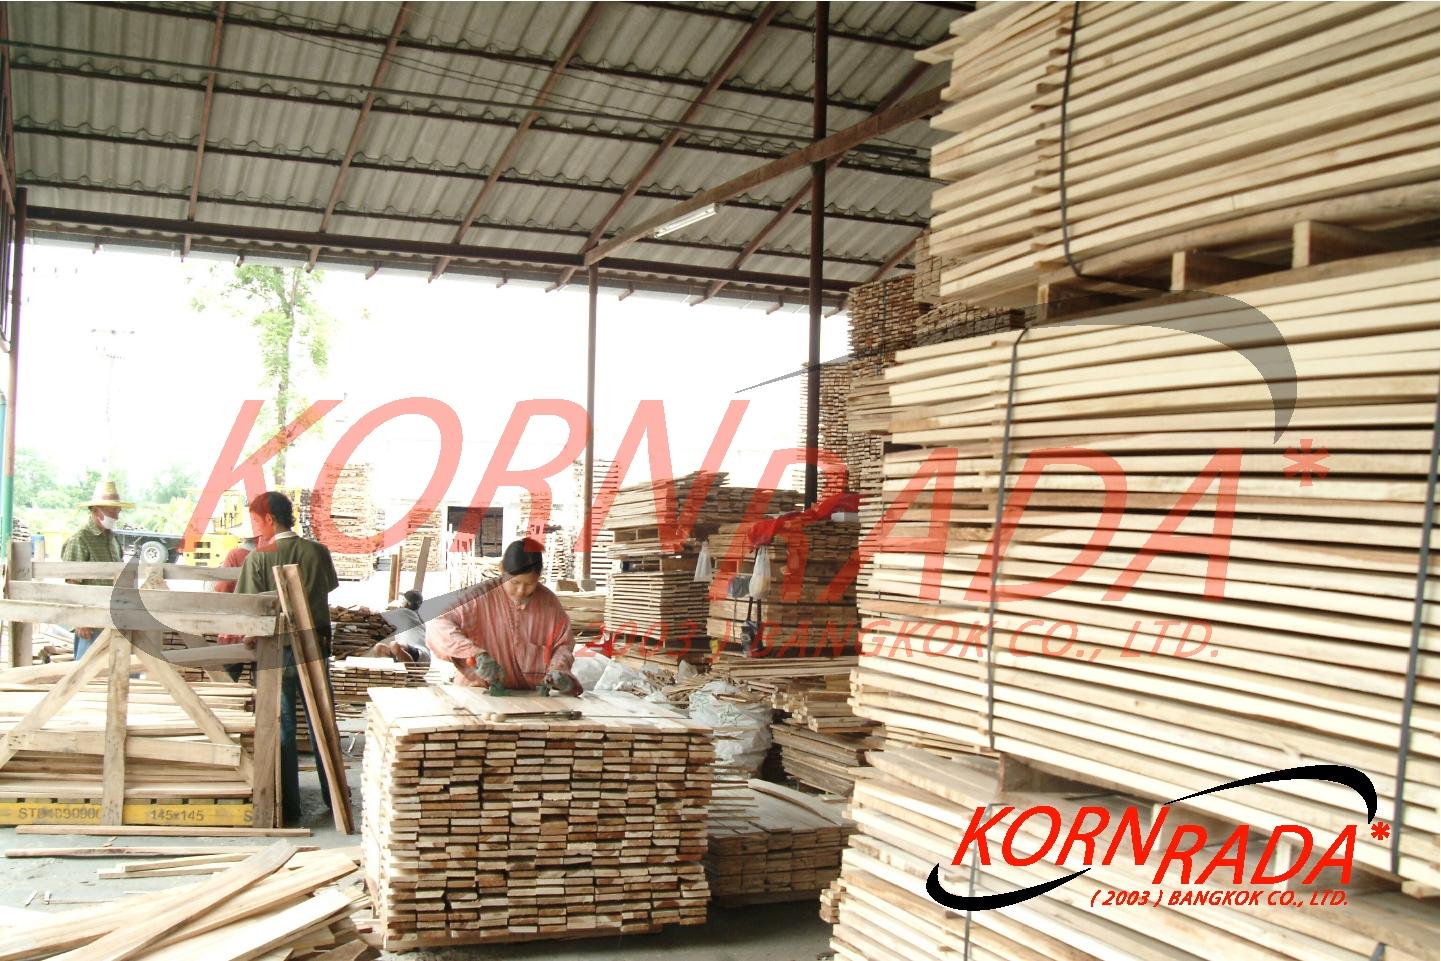 kornrada_production_1674